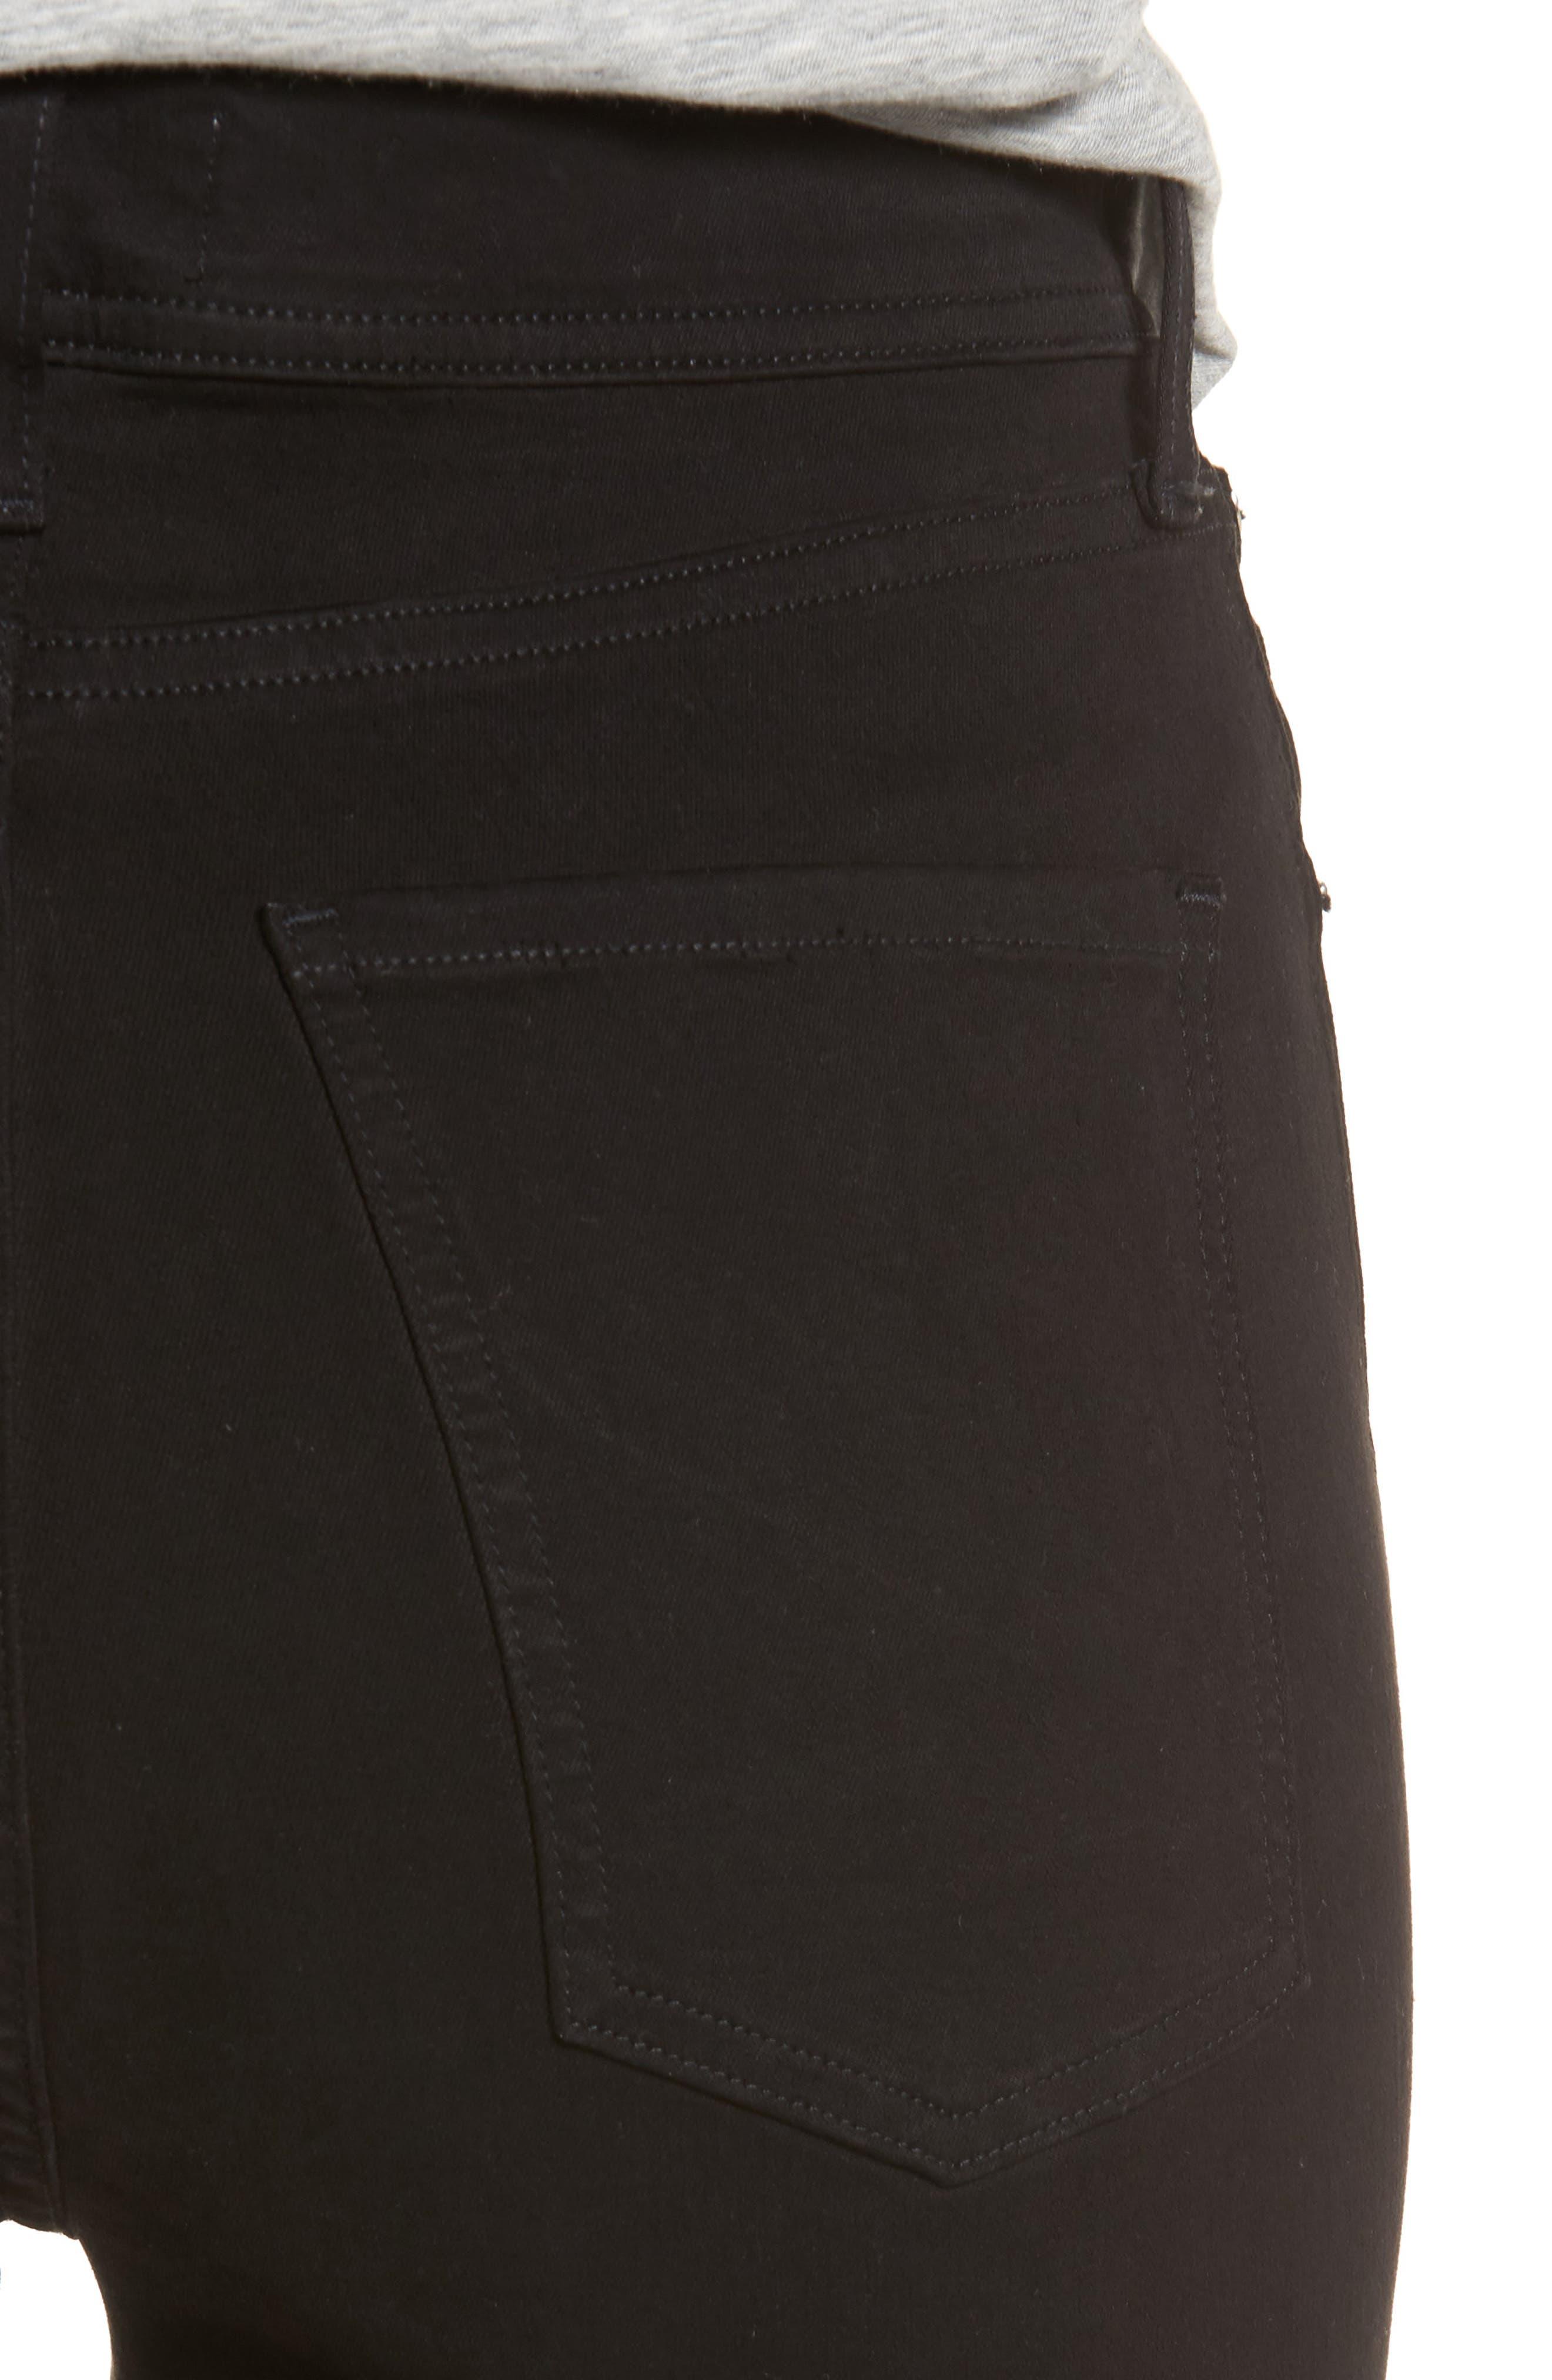 Roxanne Super High Rise Skinny Jeans,                             Alternate thumbnail 4, color,                             Jet